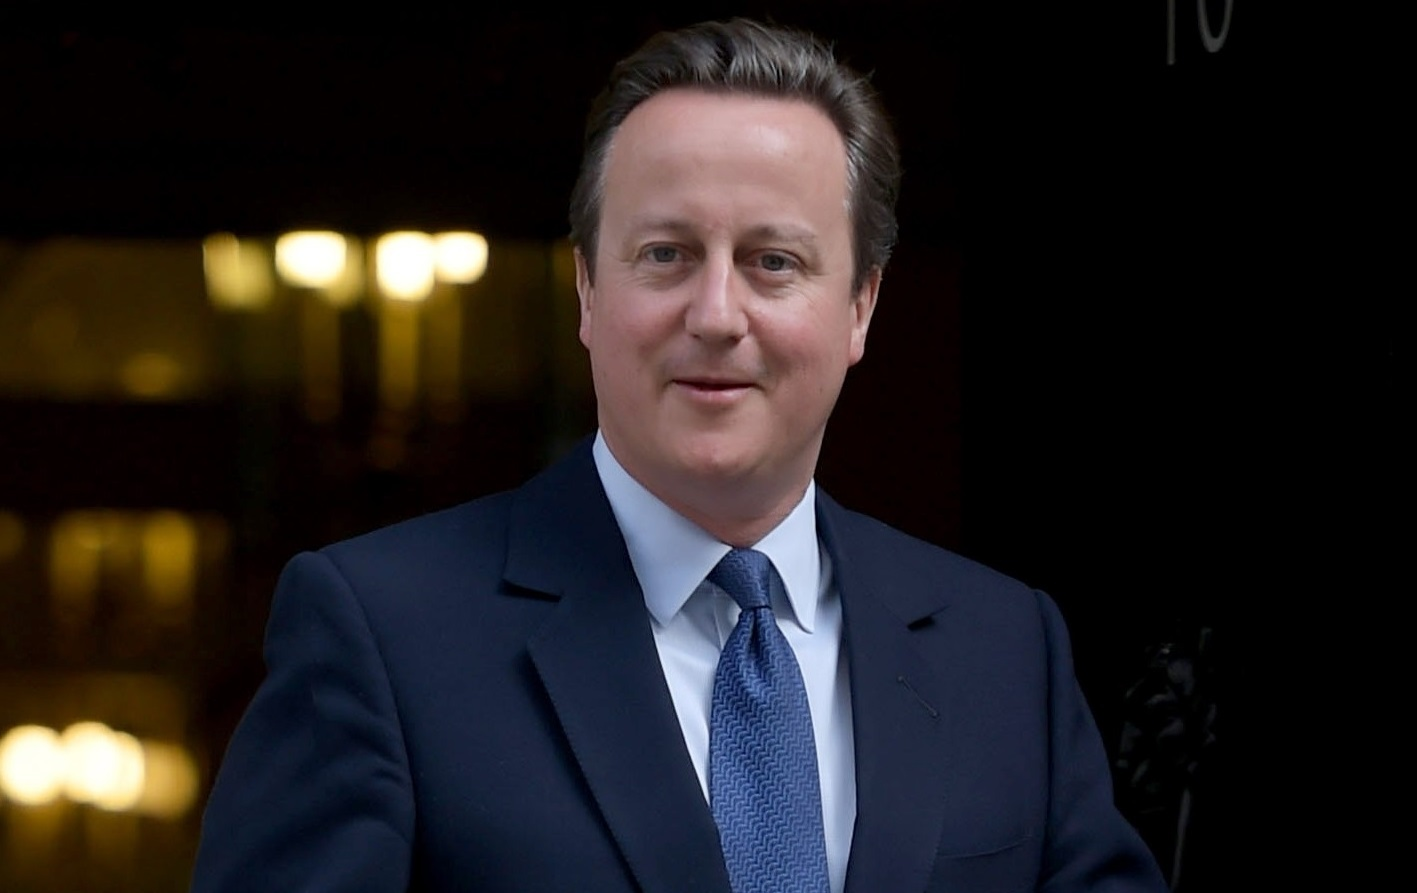 David Cameron (Kate Green/Anadolu Agency/Getty Images)